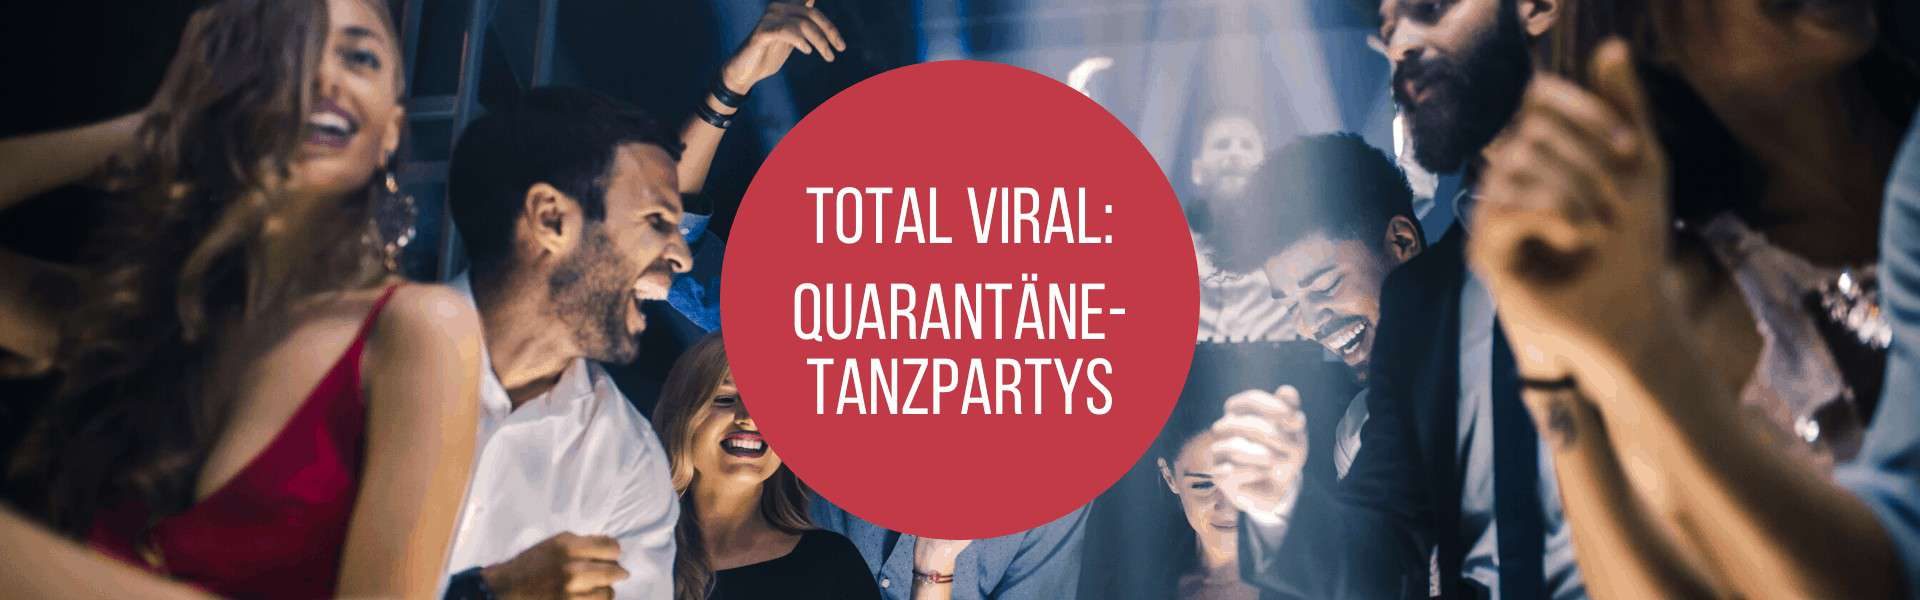 Quarantäne-Tanzpartys, Mit Quarantäne-Tanzpartys zum Instagram-Shooting Star